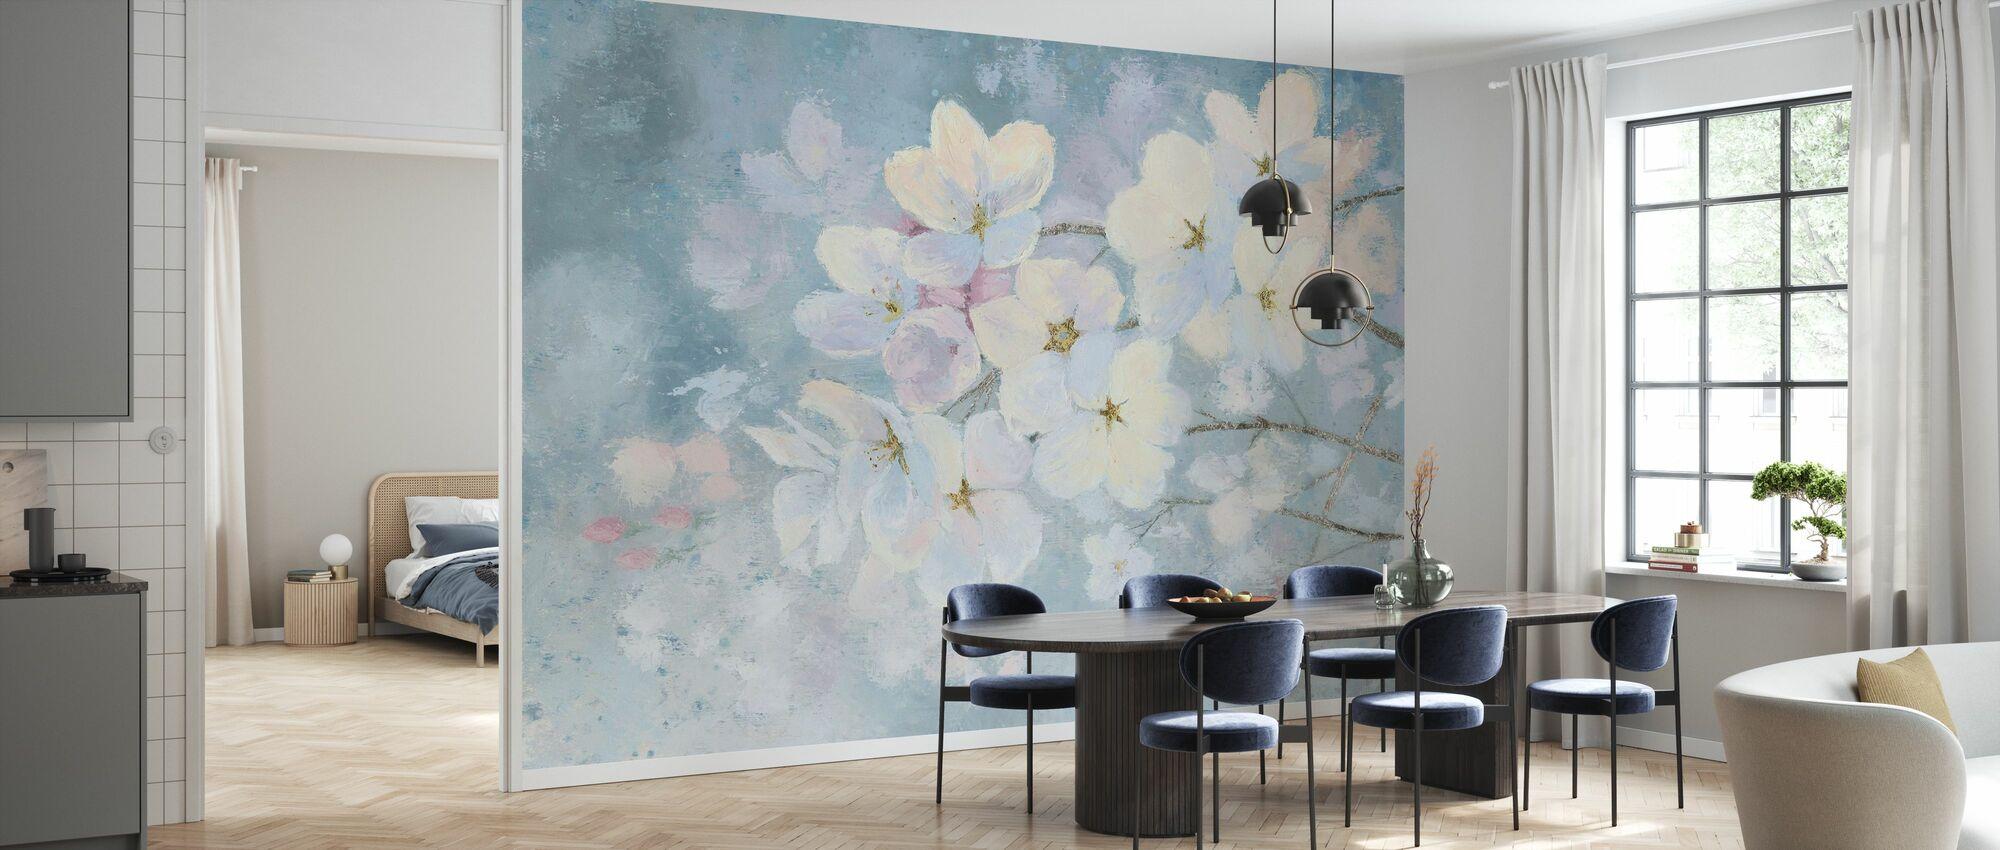 Splendid Bloom - Wallpaper - Kitchen